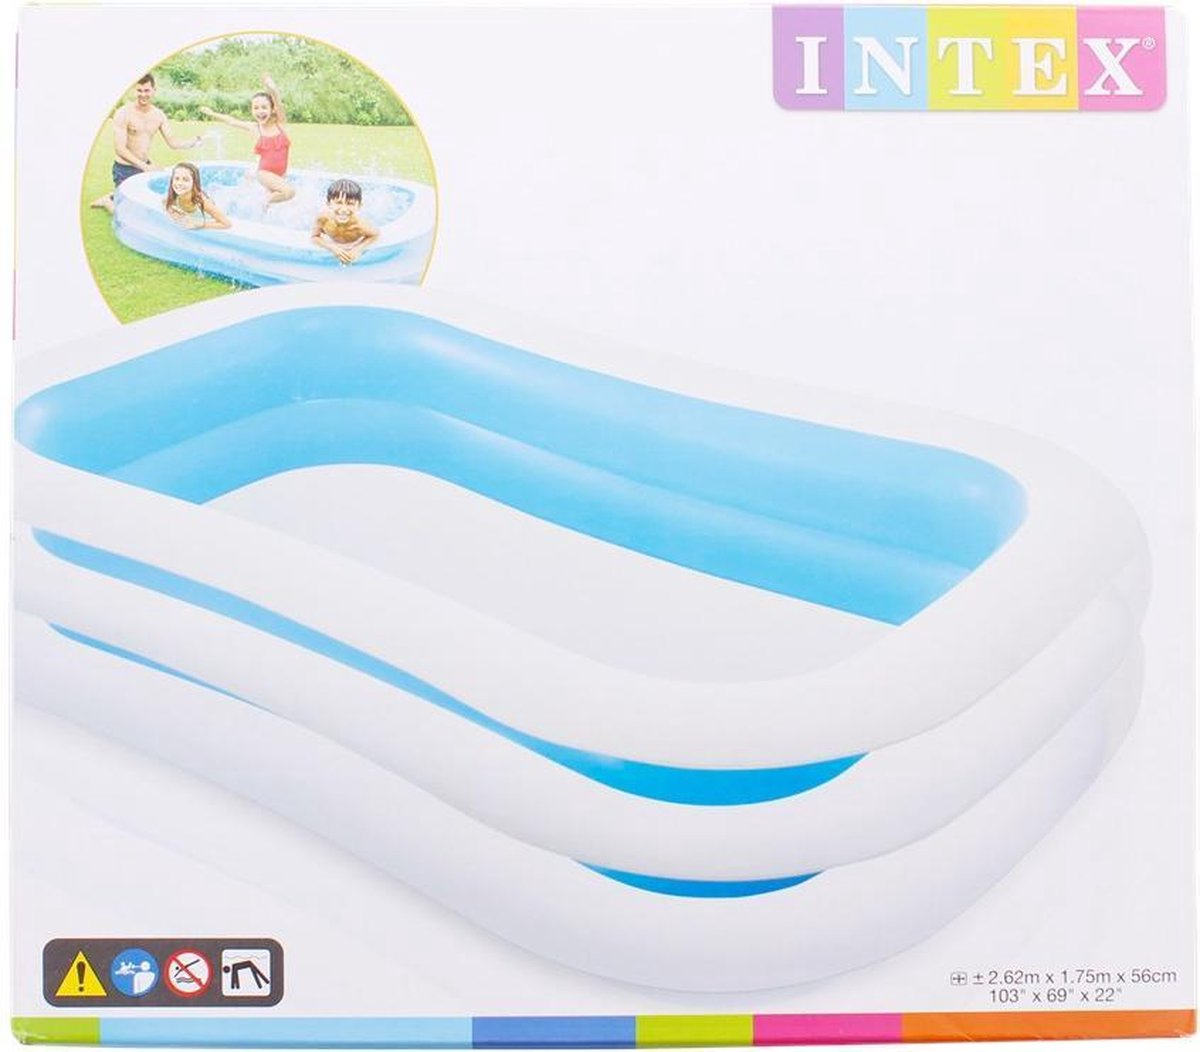 INTEX zwembad 262 x 175 x 56 cm- Intex - Opblaasbare zwembad - zwembad- opblaasbare zwembad - zwembaden - opzetzwembaden - opblaaszwembad - groen - blauw